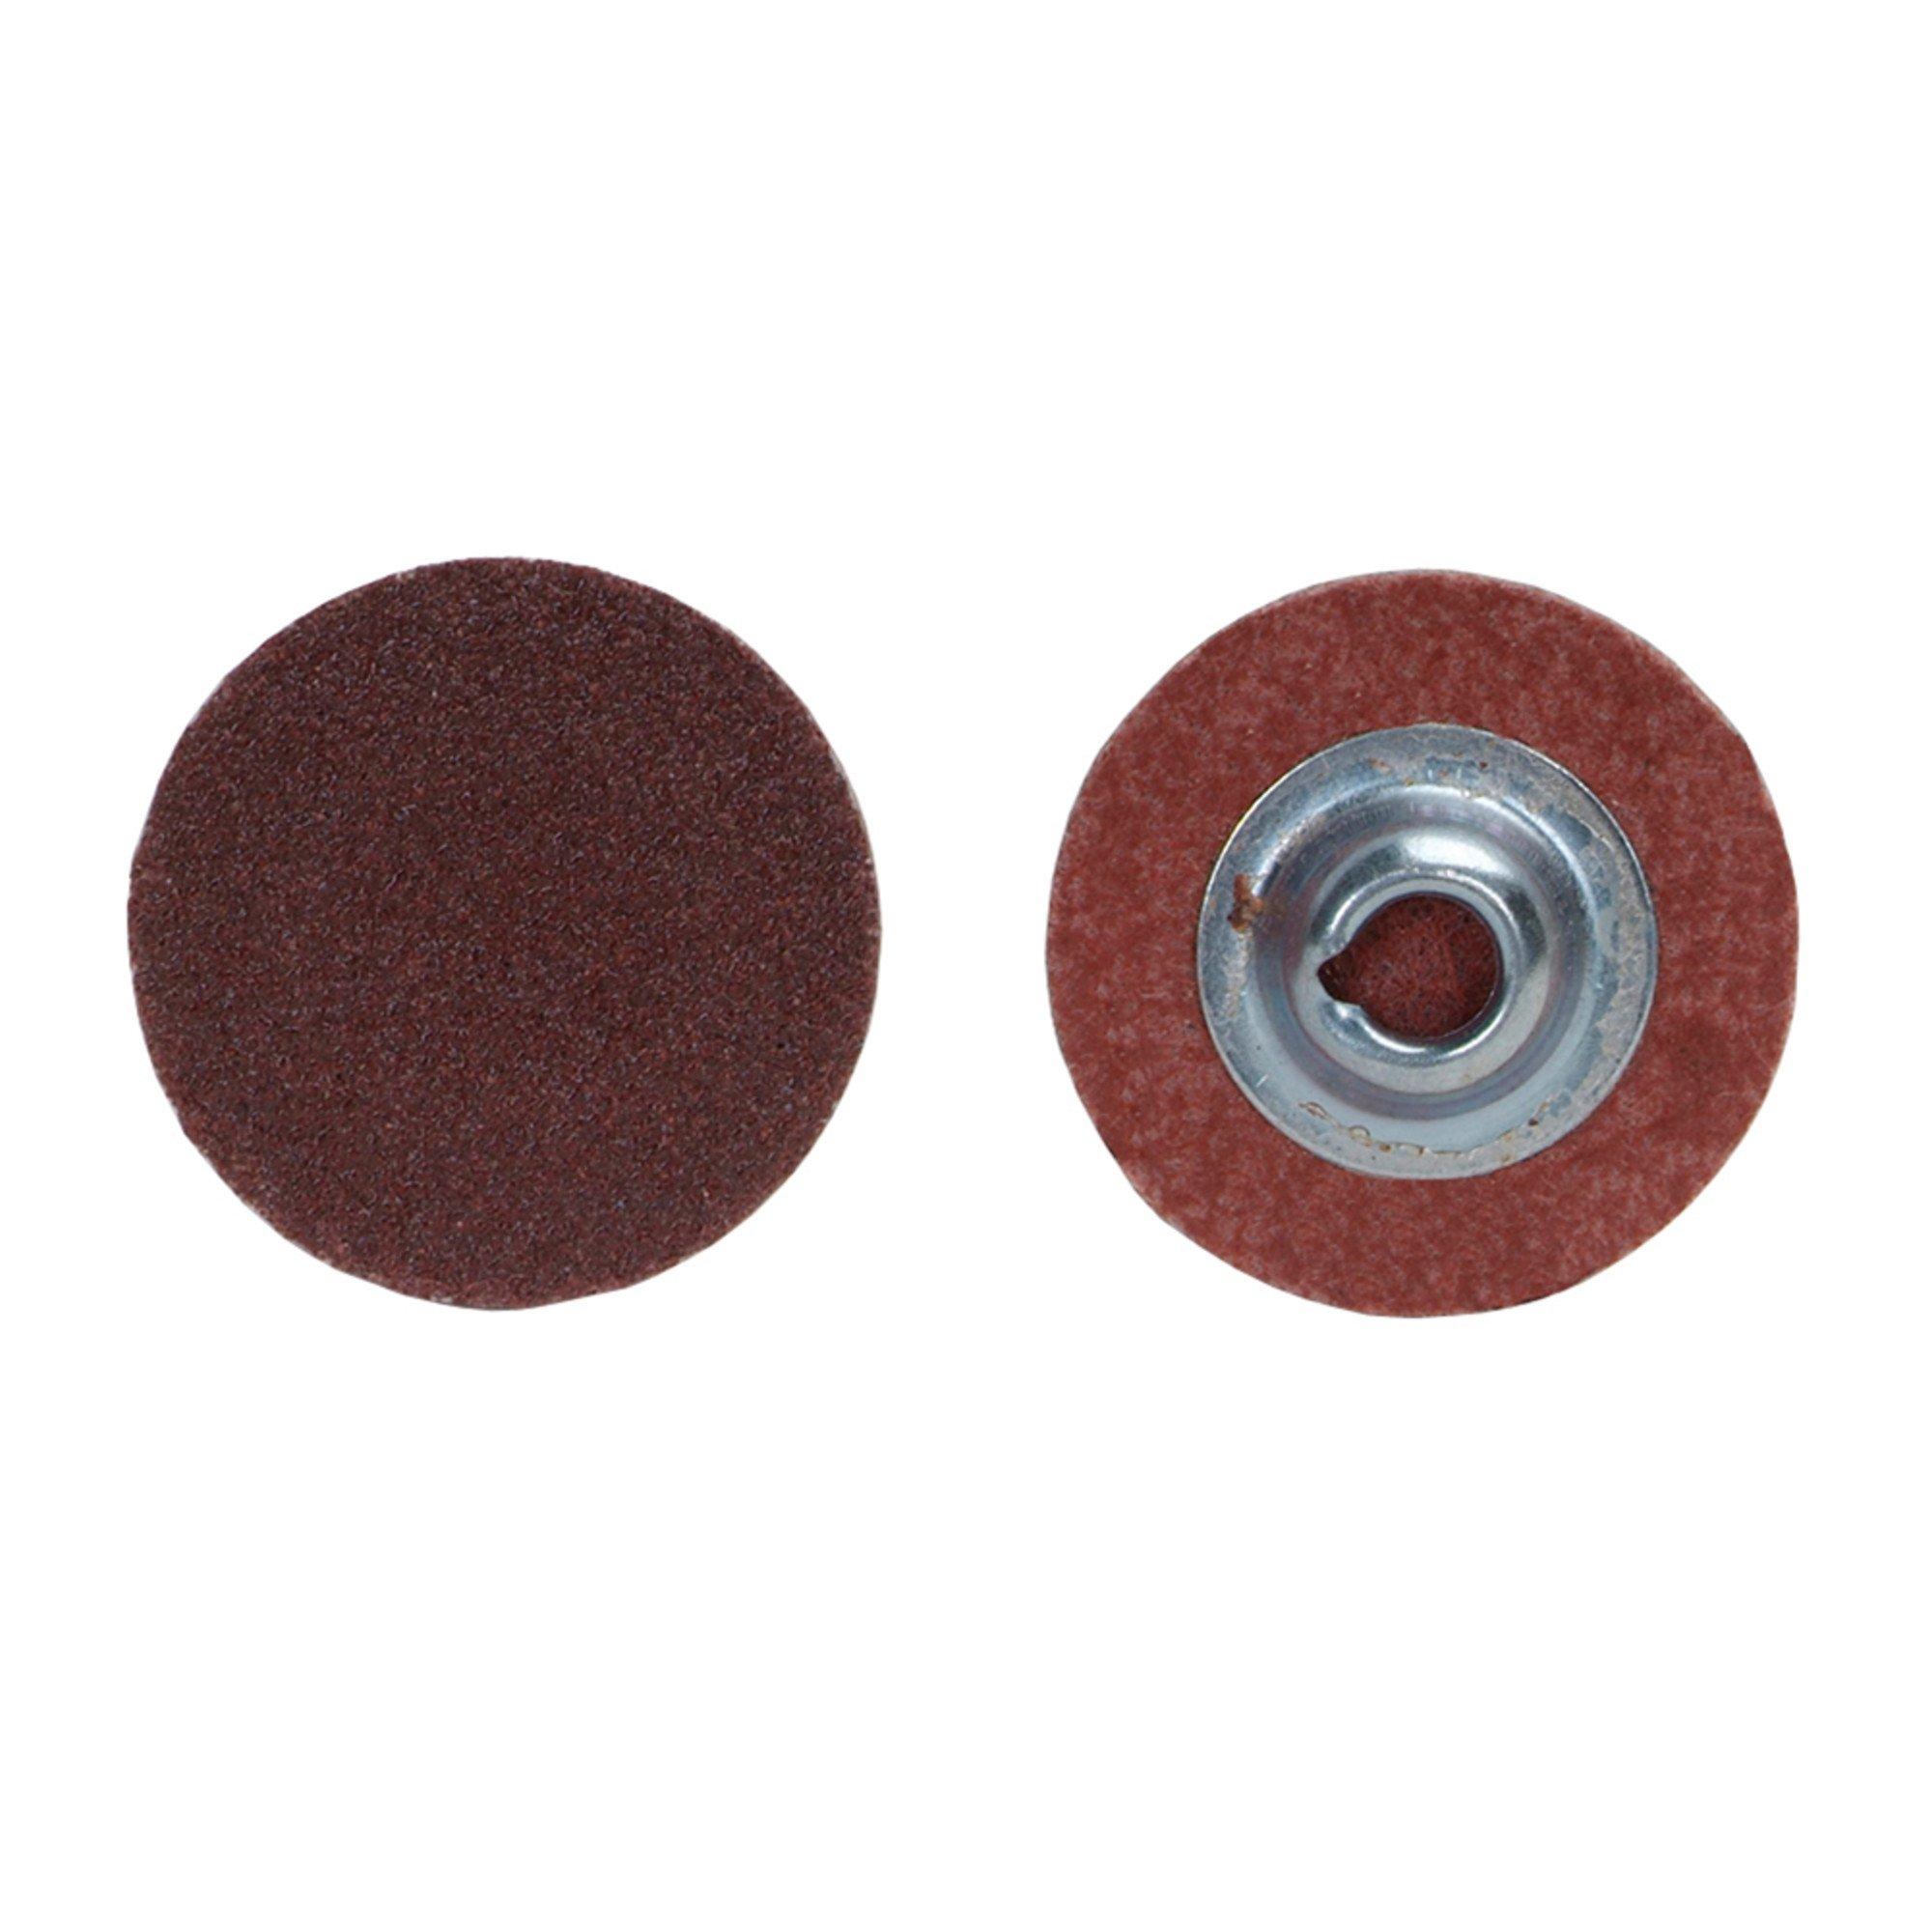 Norton R228 Metalite Speed-Lok Abrasive Disc, Cloth Backing, TS, Aluminum Oxide, 2'' Diameter, Grit 80   (Pack of 100) by Norton Abrasives - St. Gobain